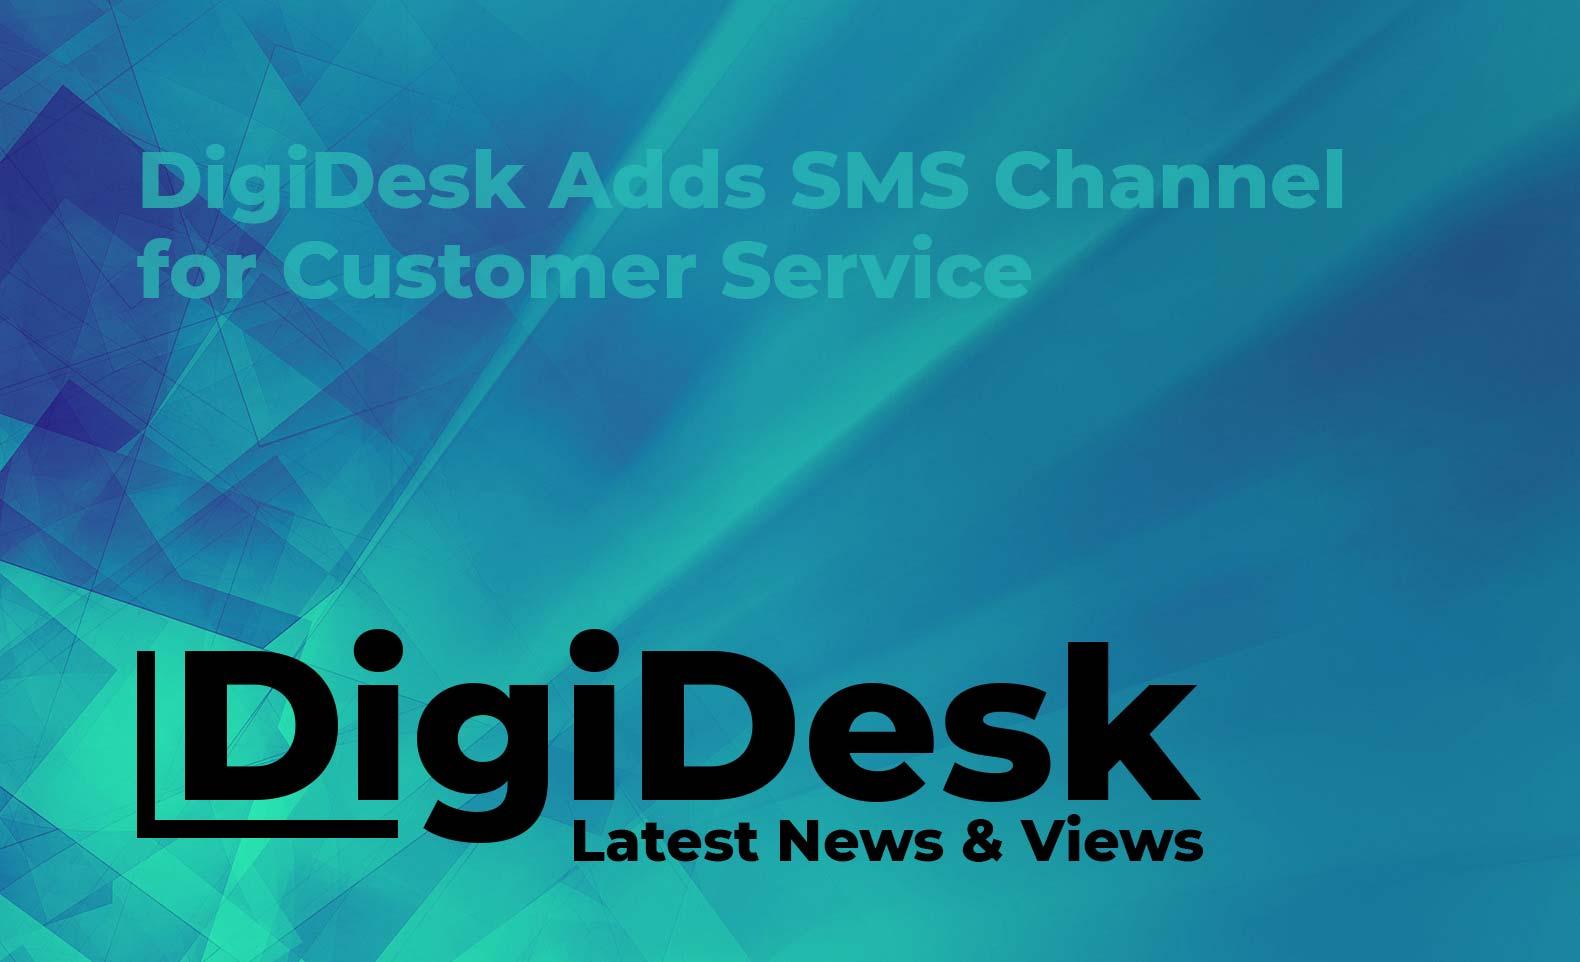 Blog banner - DigiDesk adds SMS channel for customer service